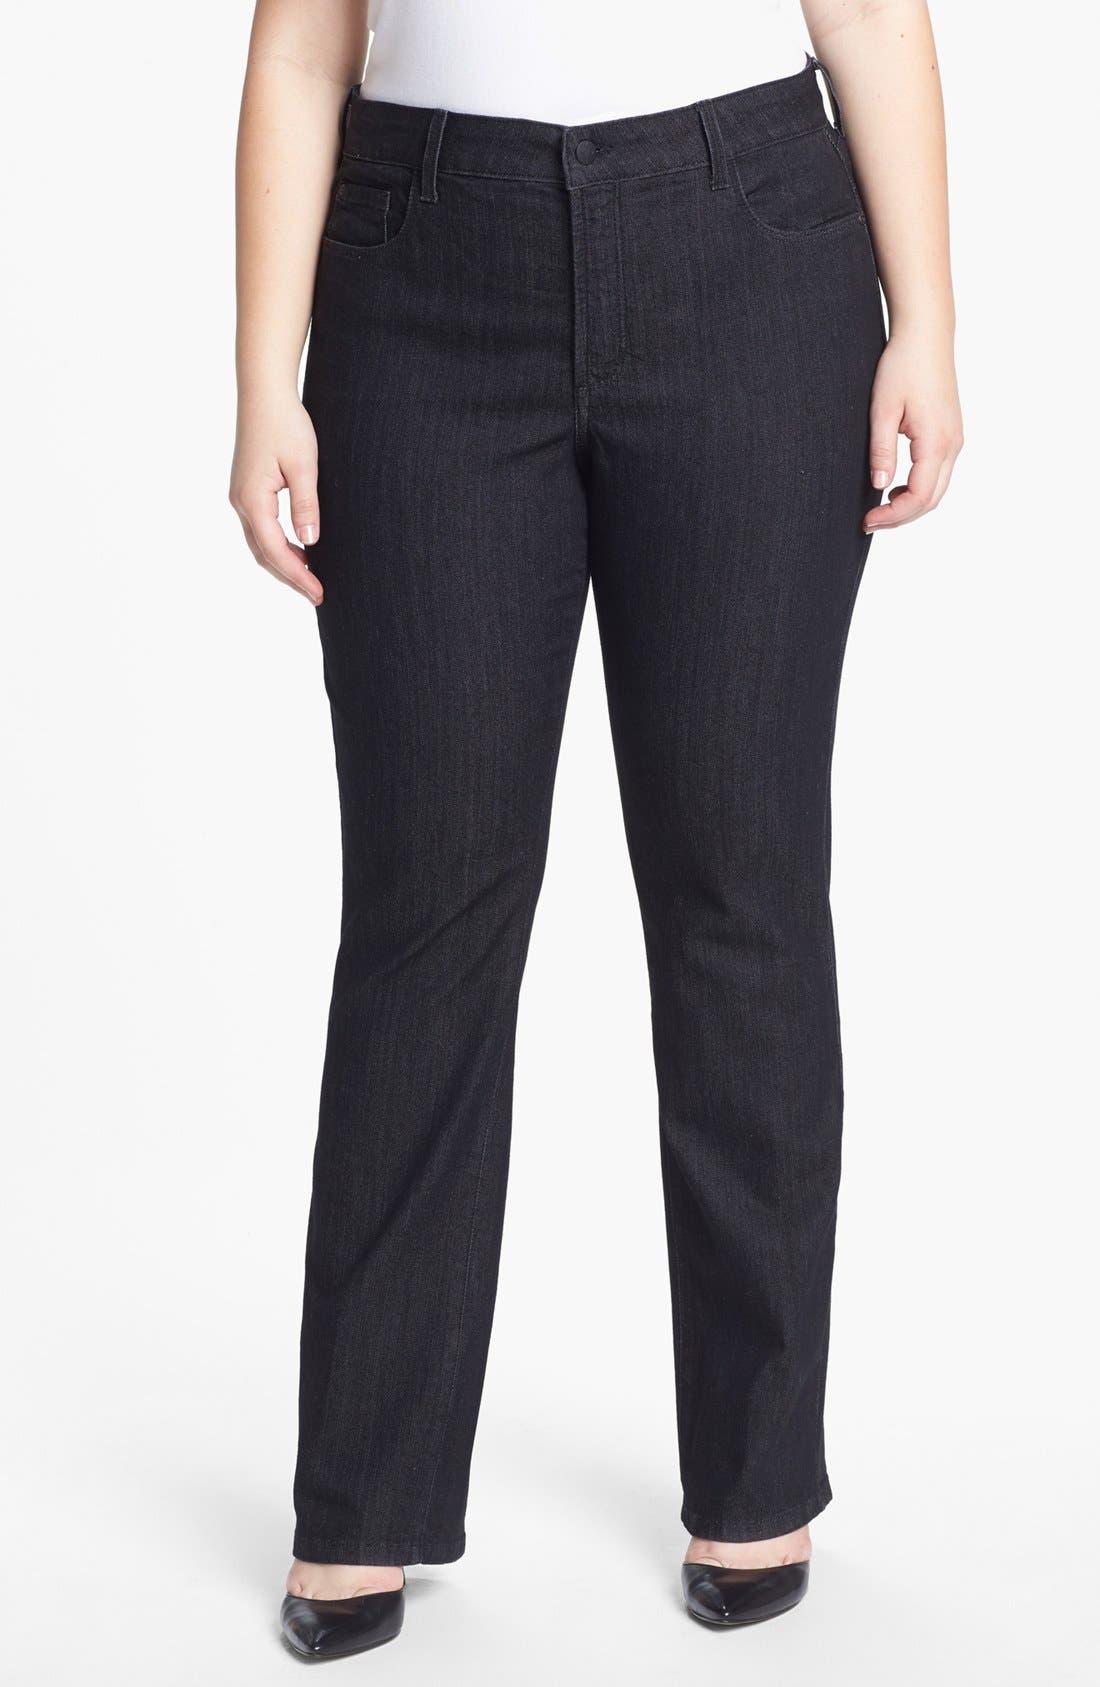 Alternate Image 2  - NYDJ 'Marilyn' Faux Leather Detail Straight Leg Jeans (Plus Size)